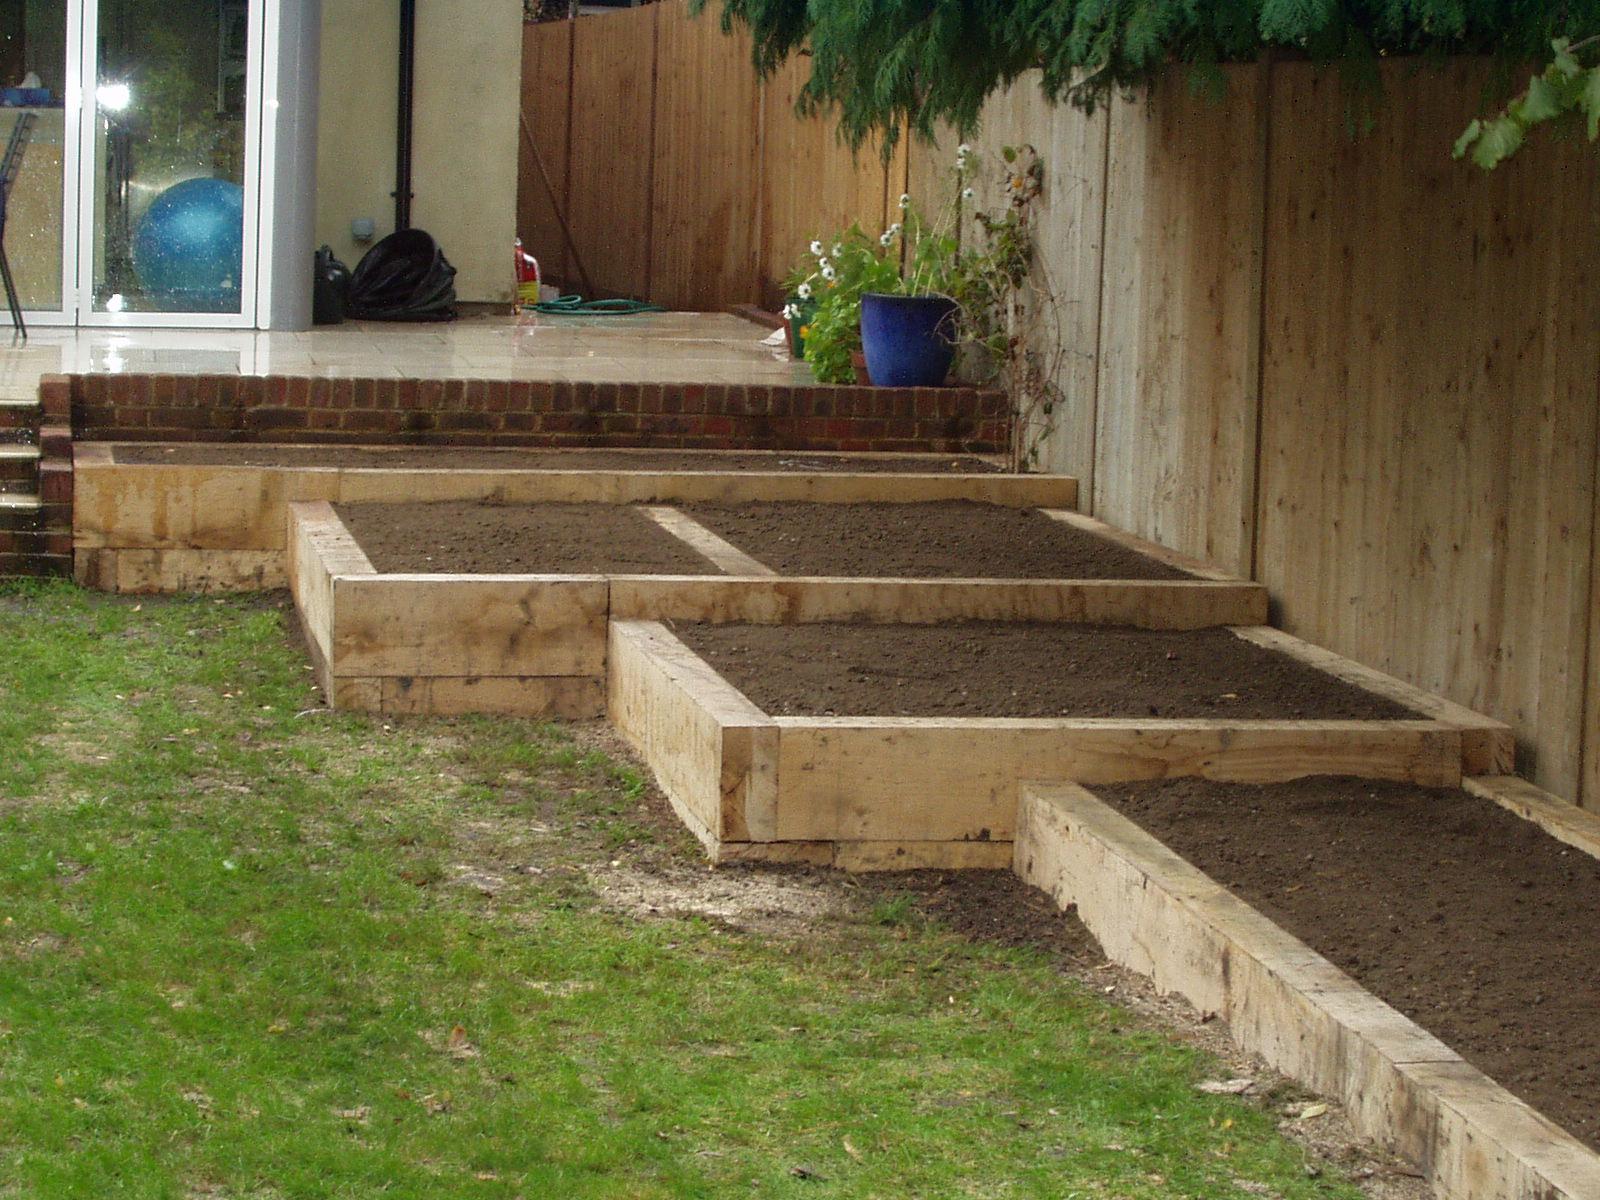 Sleepers forevergreen gardens for Garden designs using sleepers